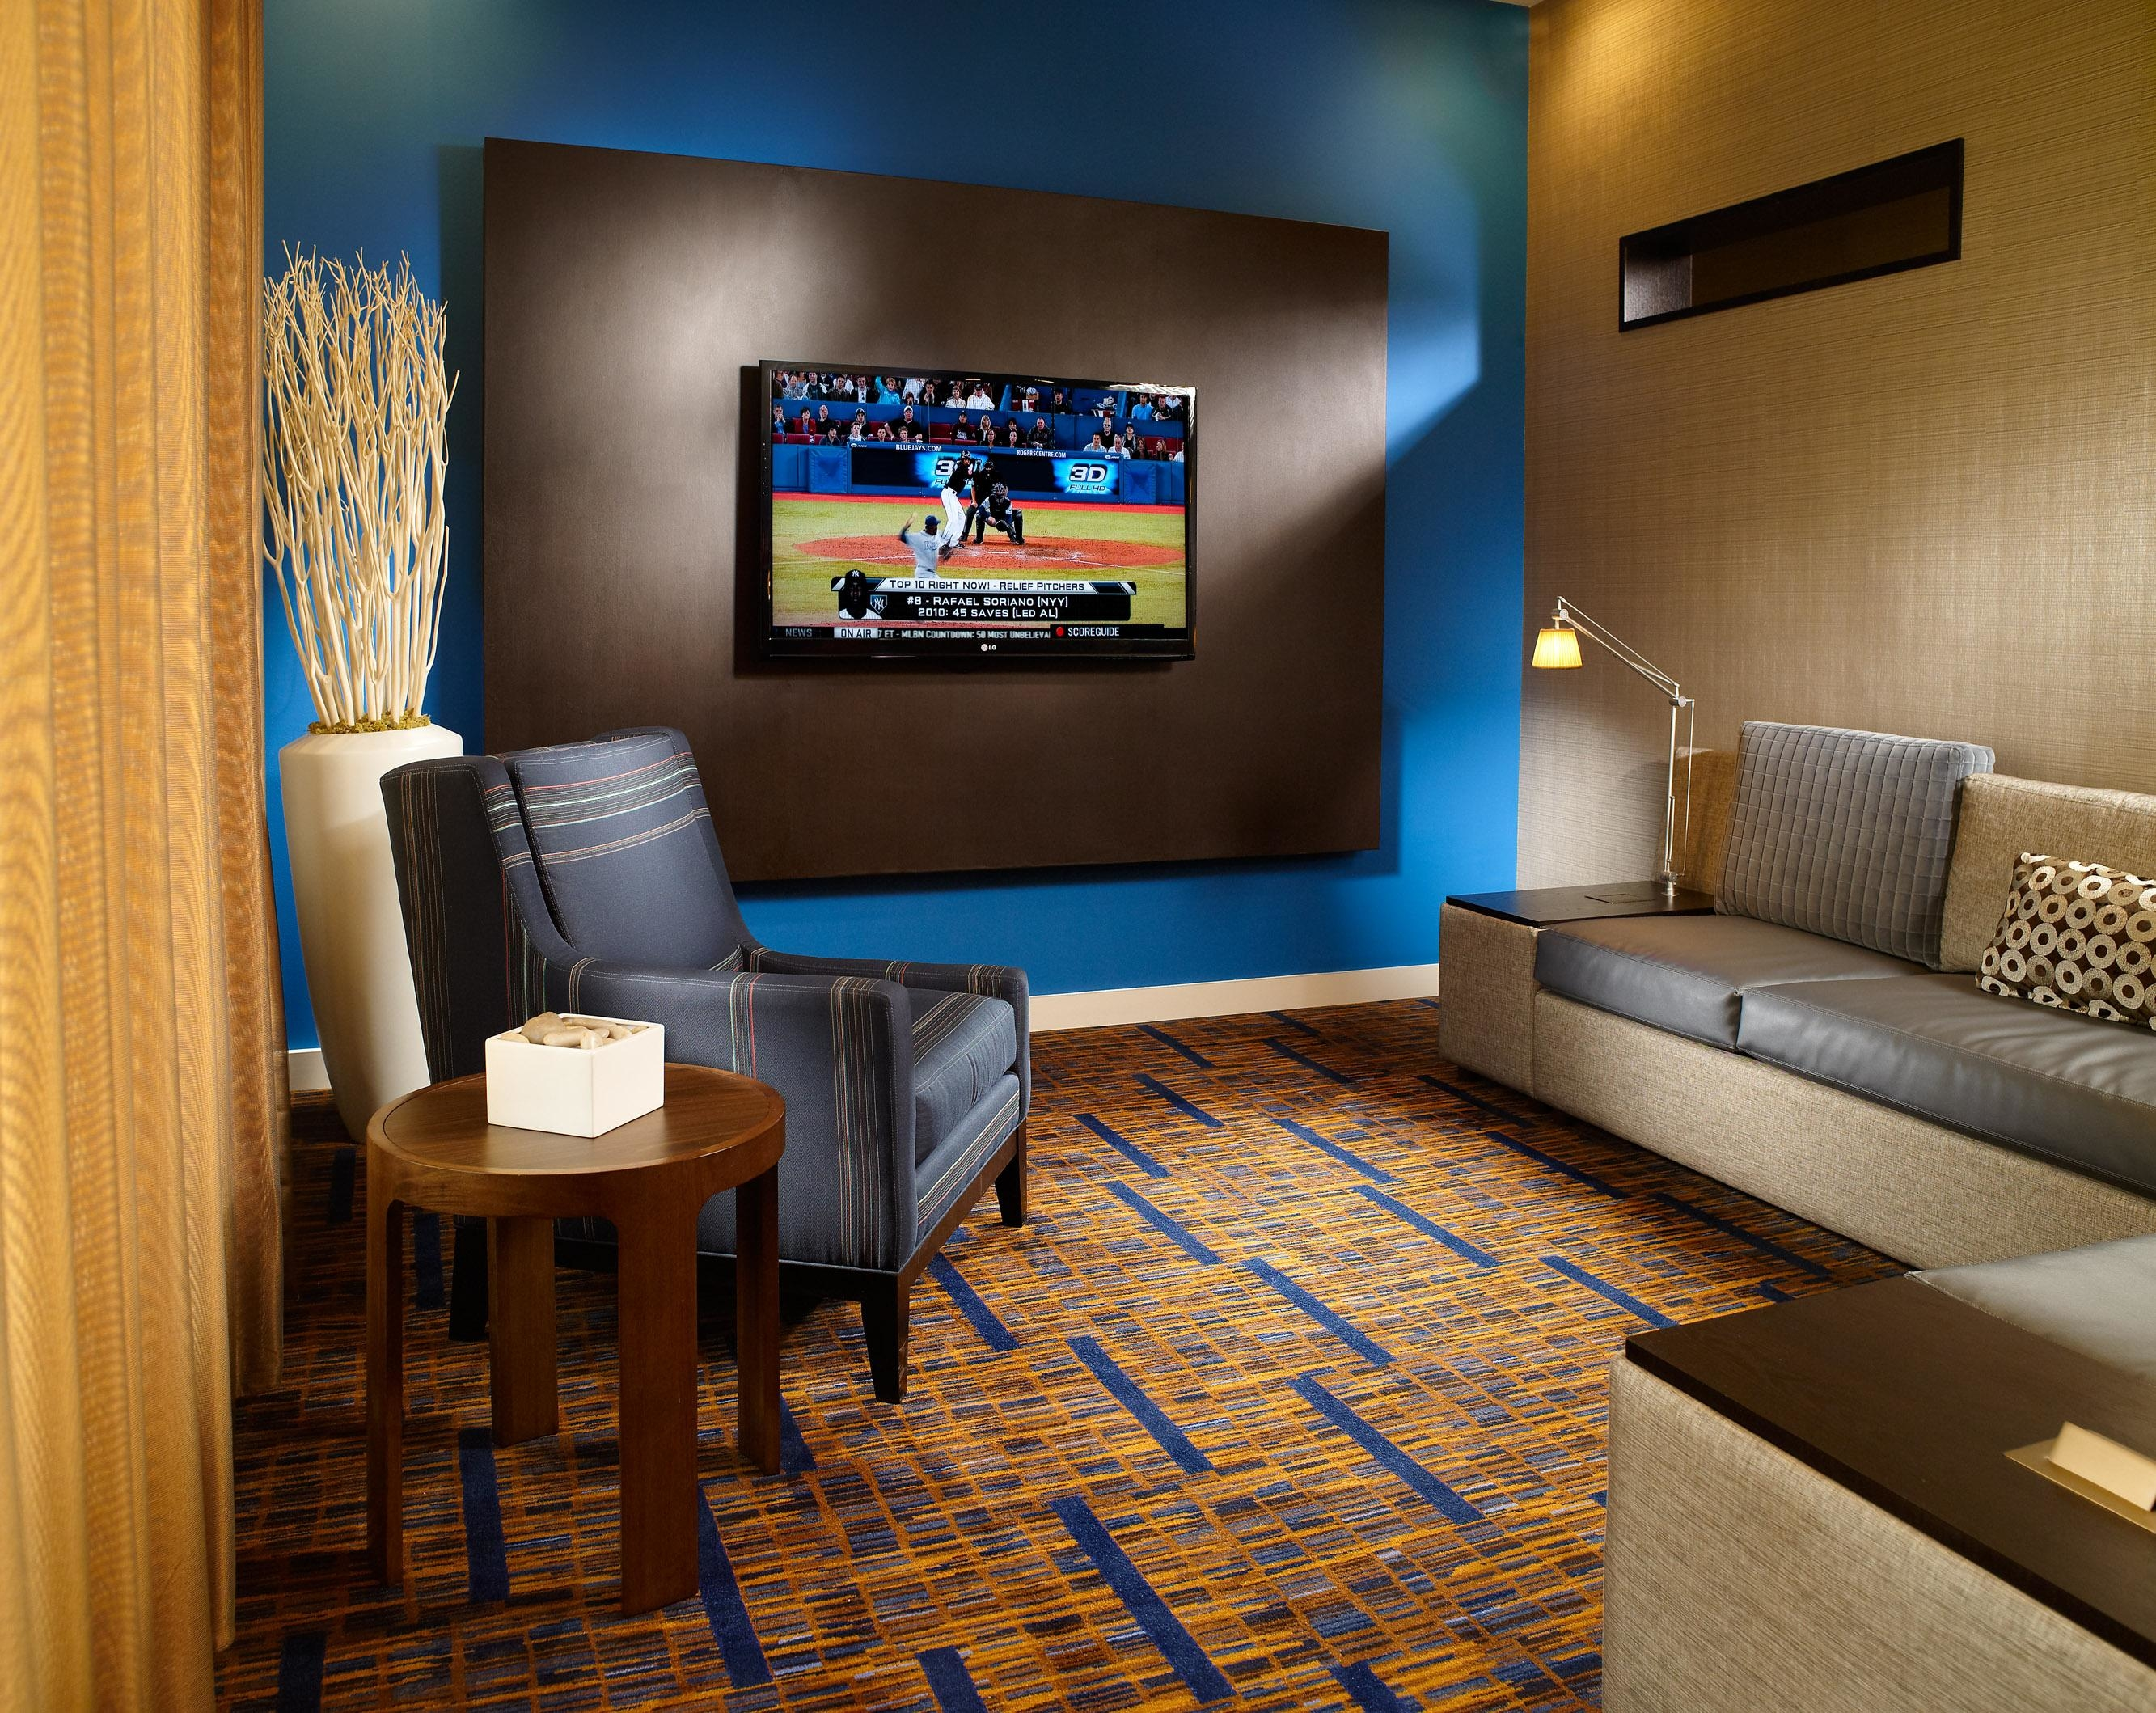 Http Www Marriott Com Hotels Travel Atlep Courtyard Atlanta Executive Park Emory